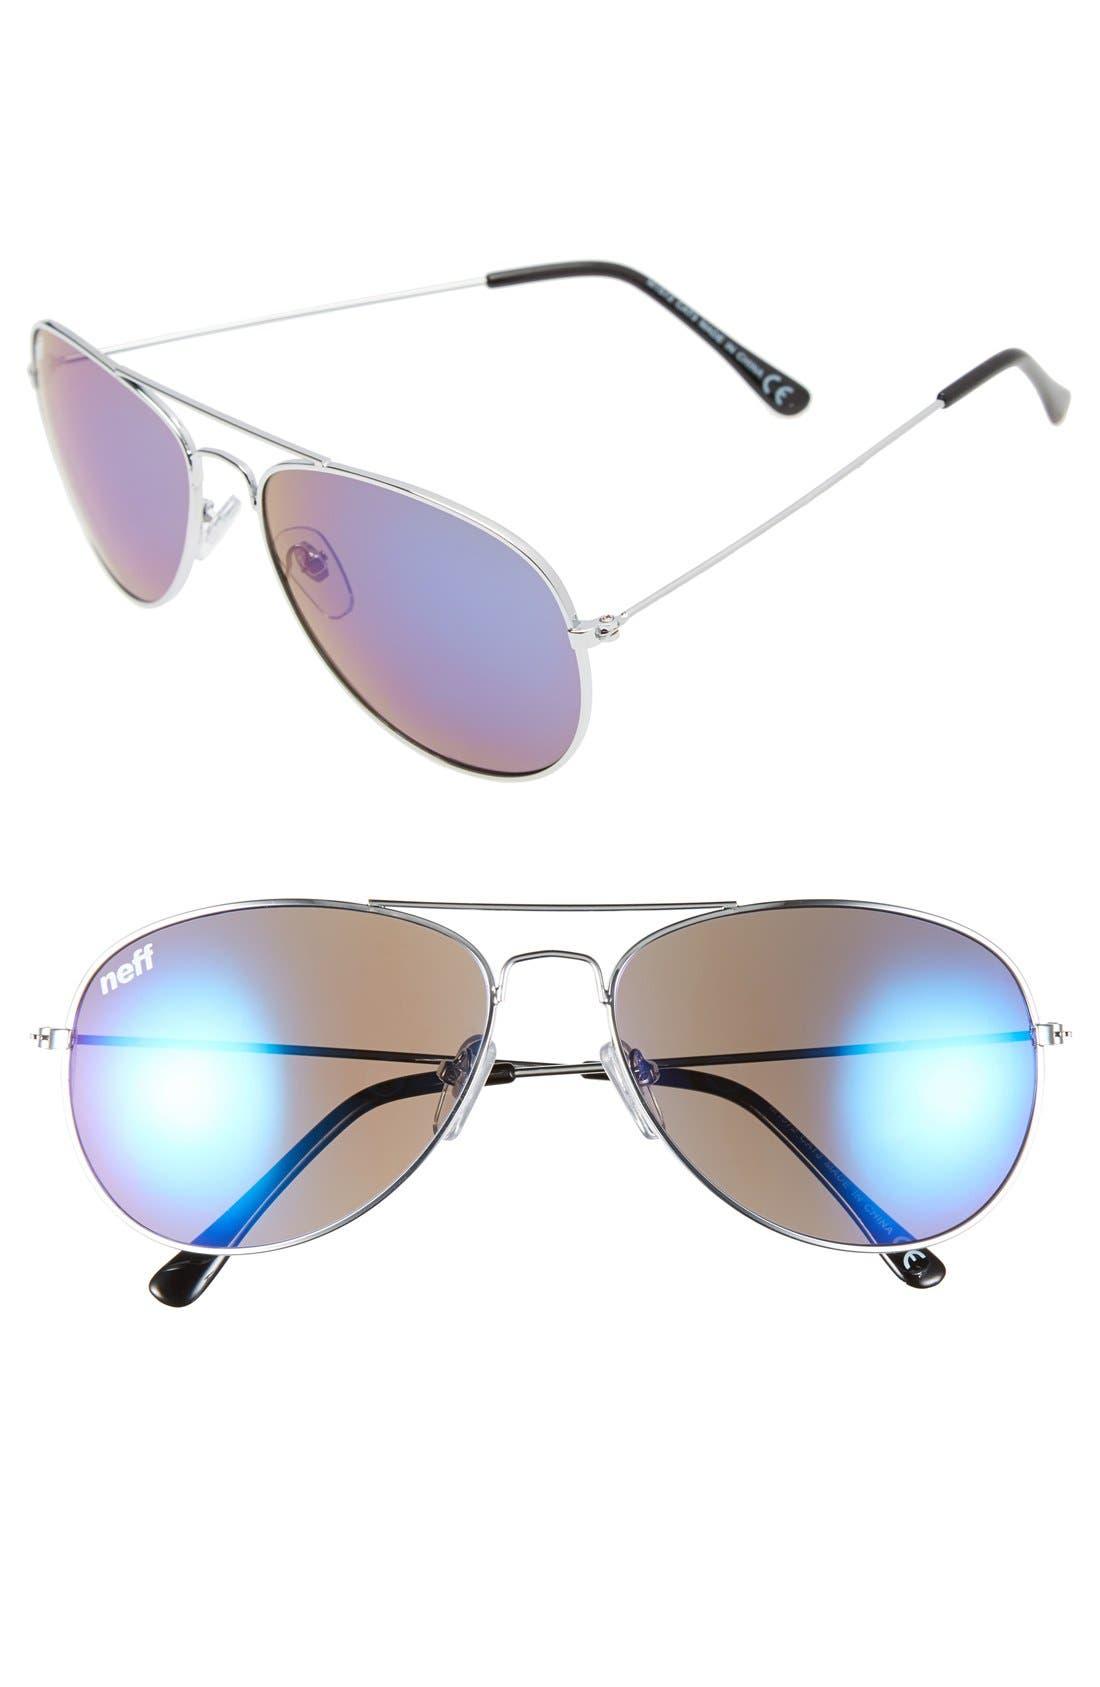 'Bronz' Aviator Sunglasses, 59mm,                             Main thumbnail 1, color,                             041